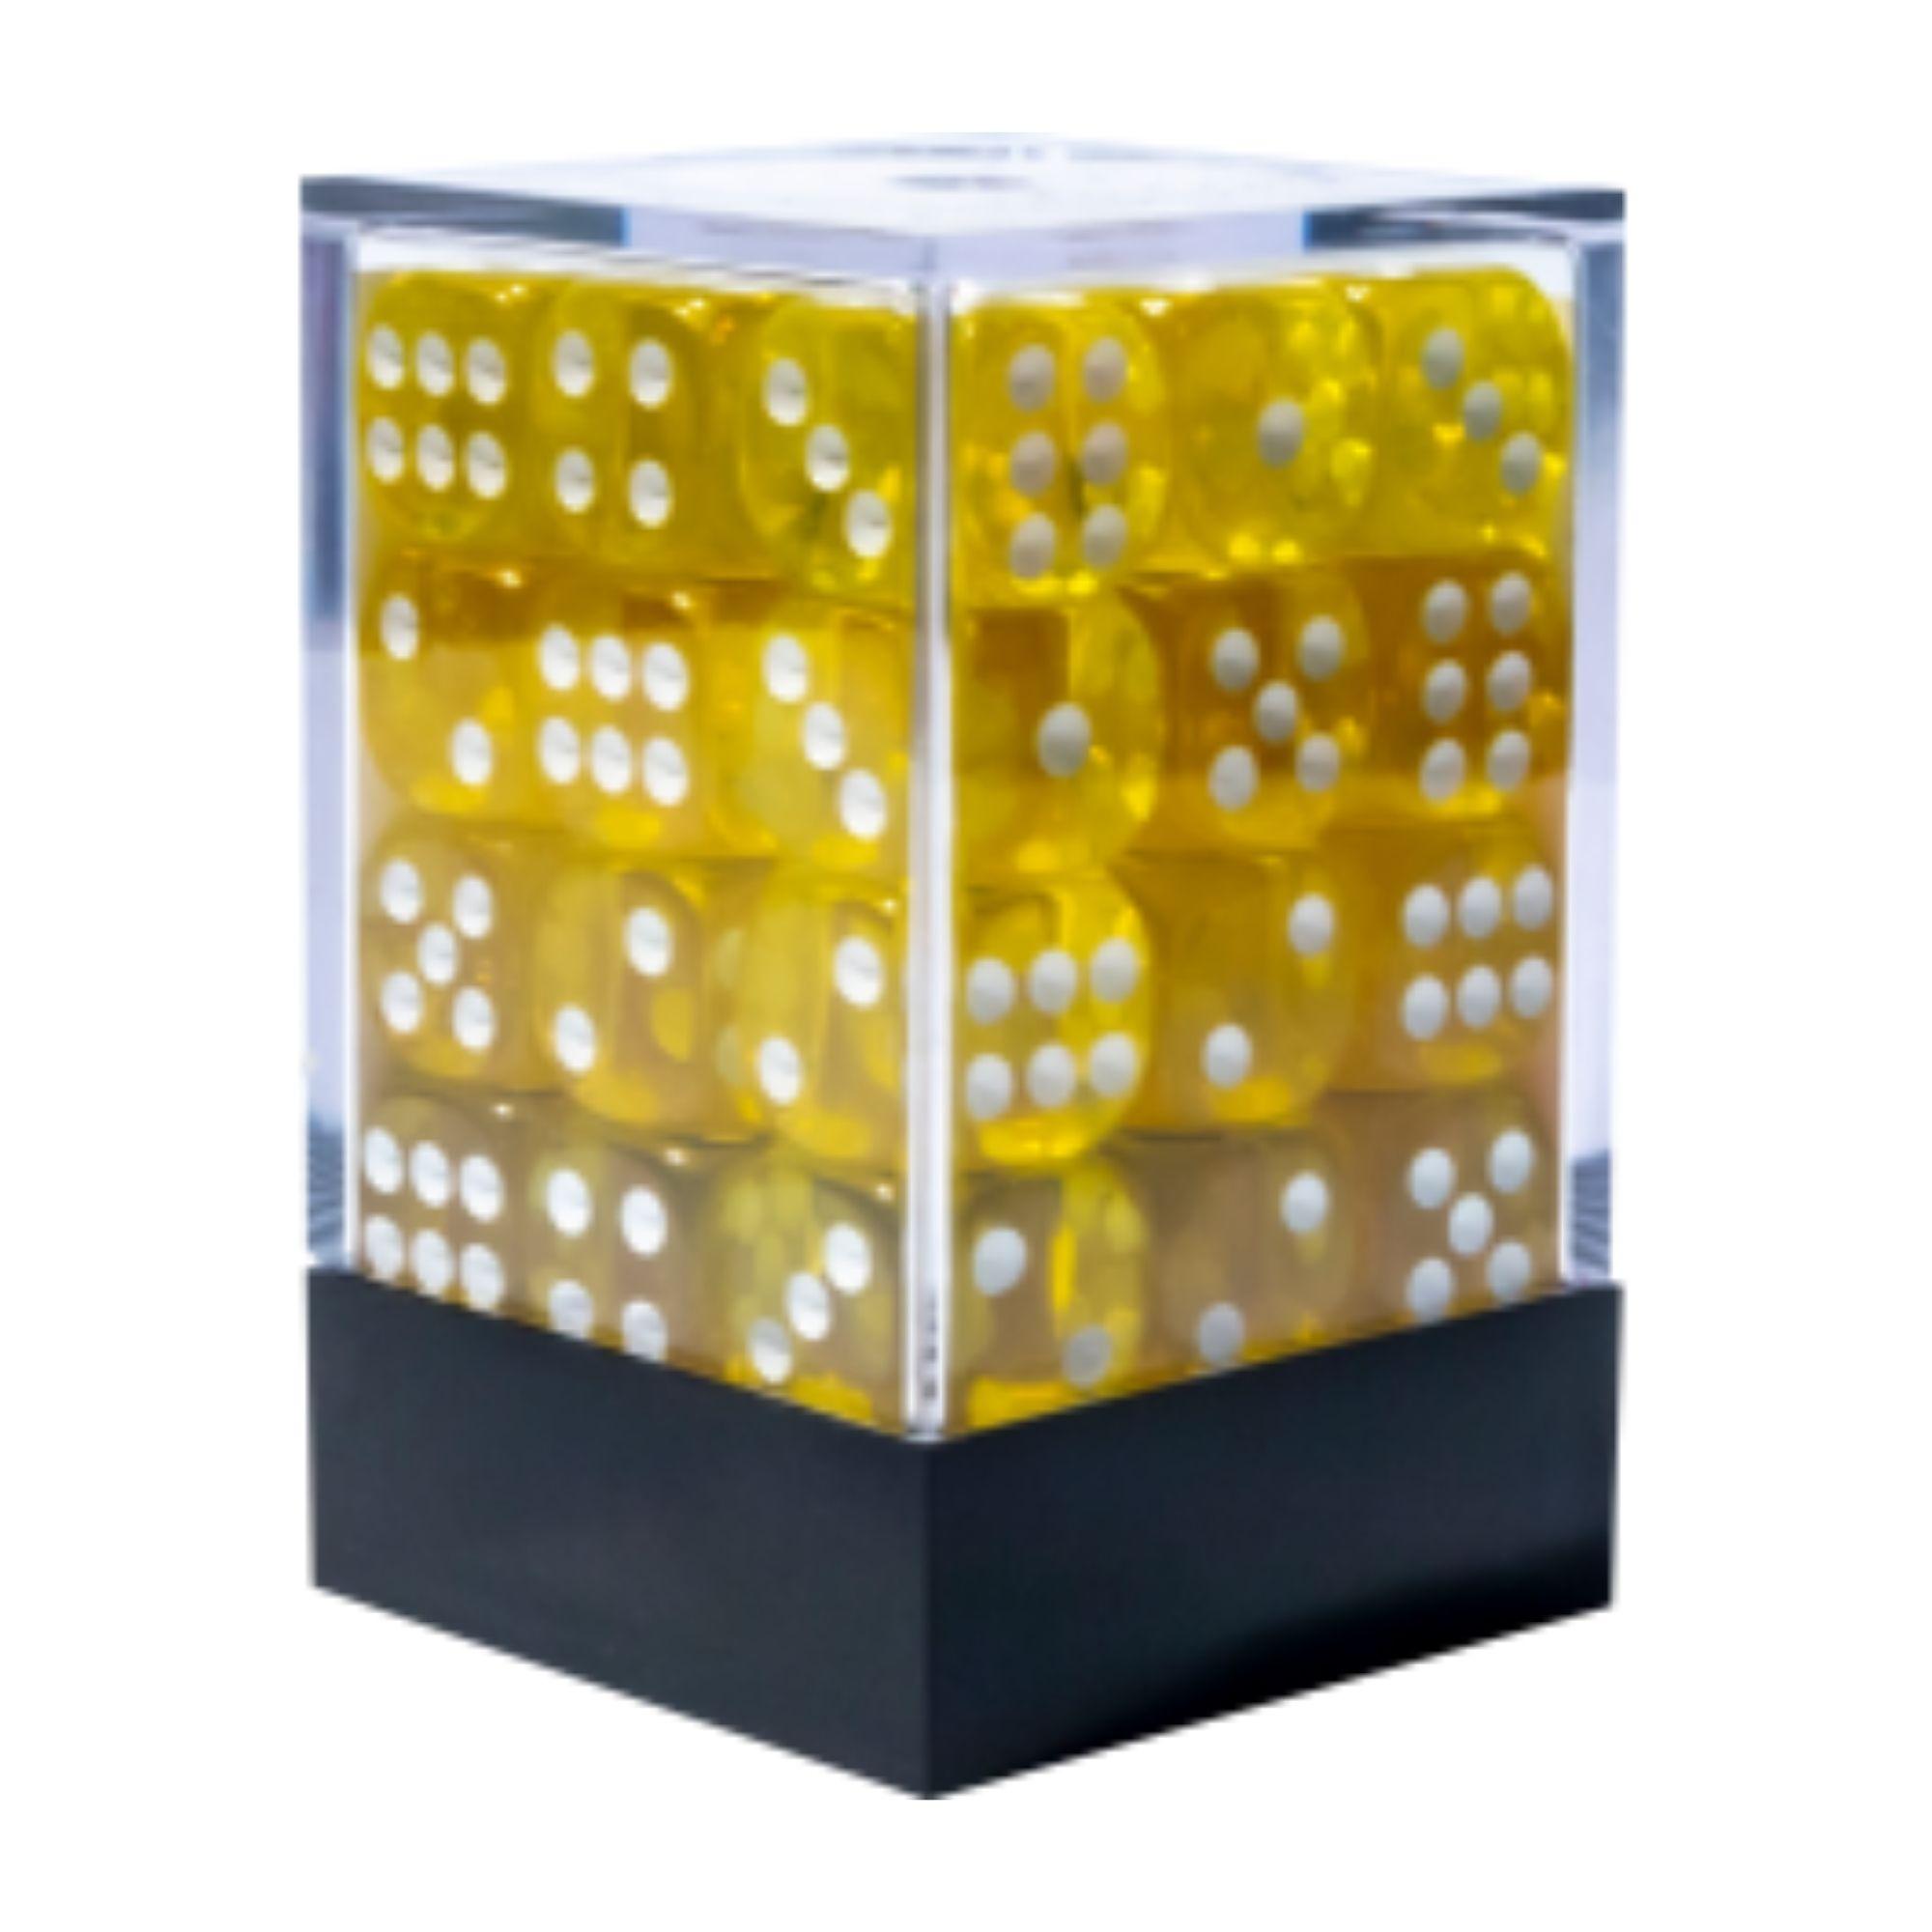 Central Dices Conjuntos 36 Dados D6 Translúcido Amarelo e Branco